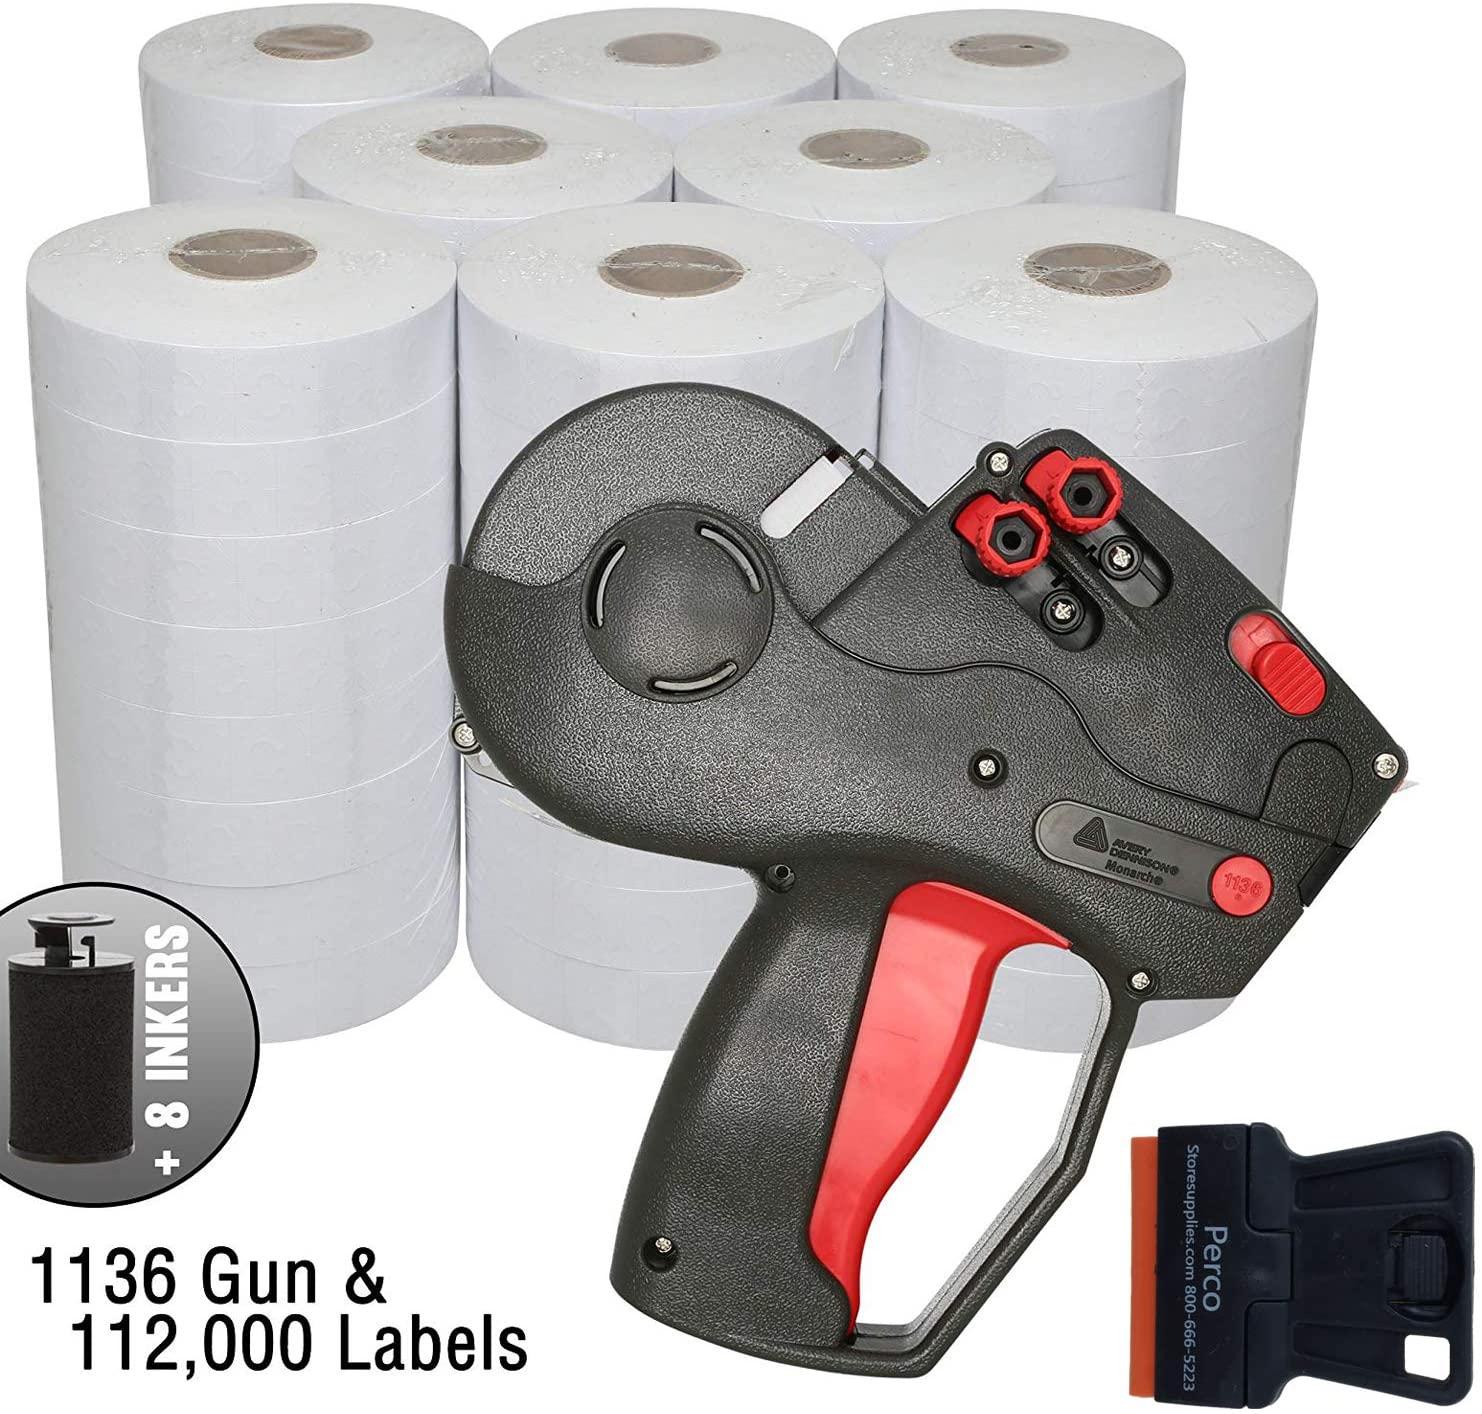 Monarch 1136 Price Gun with Labels Value Pack: Includes Monarch 1136 Pricing Gun, 112,000 White Pricemarking Labels, Bonus Inkers